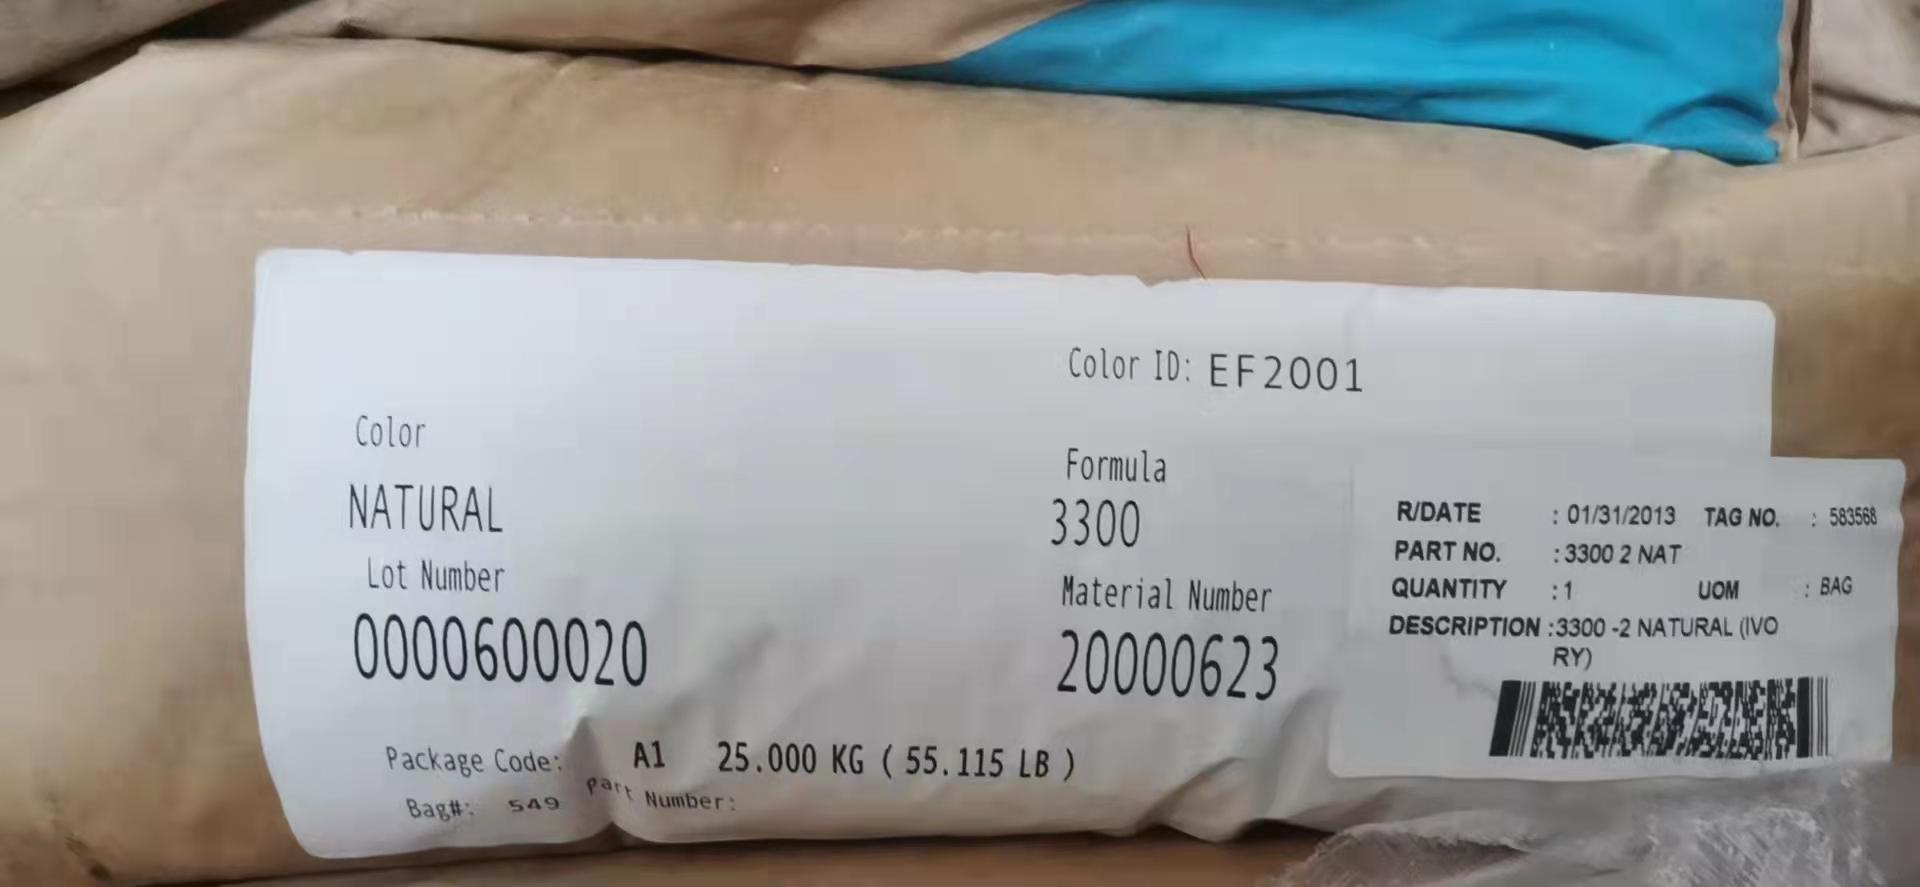 Celanex 3300 EF2001